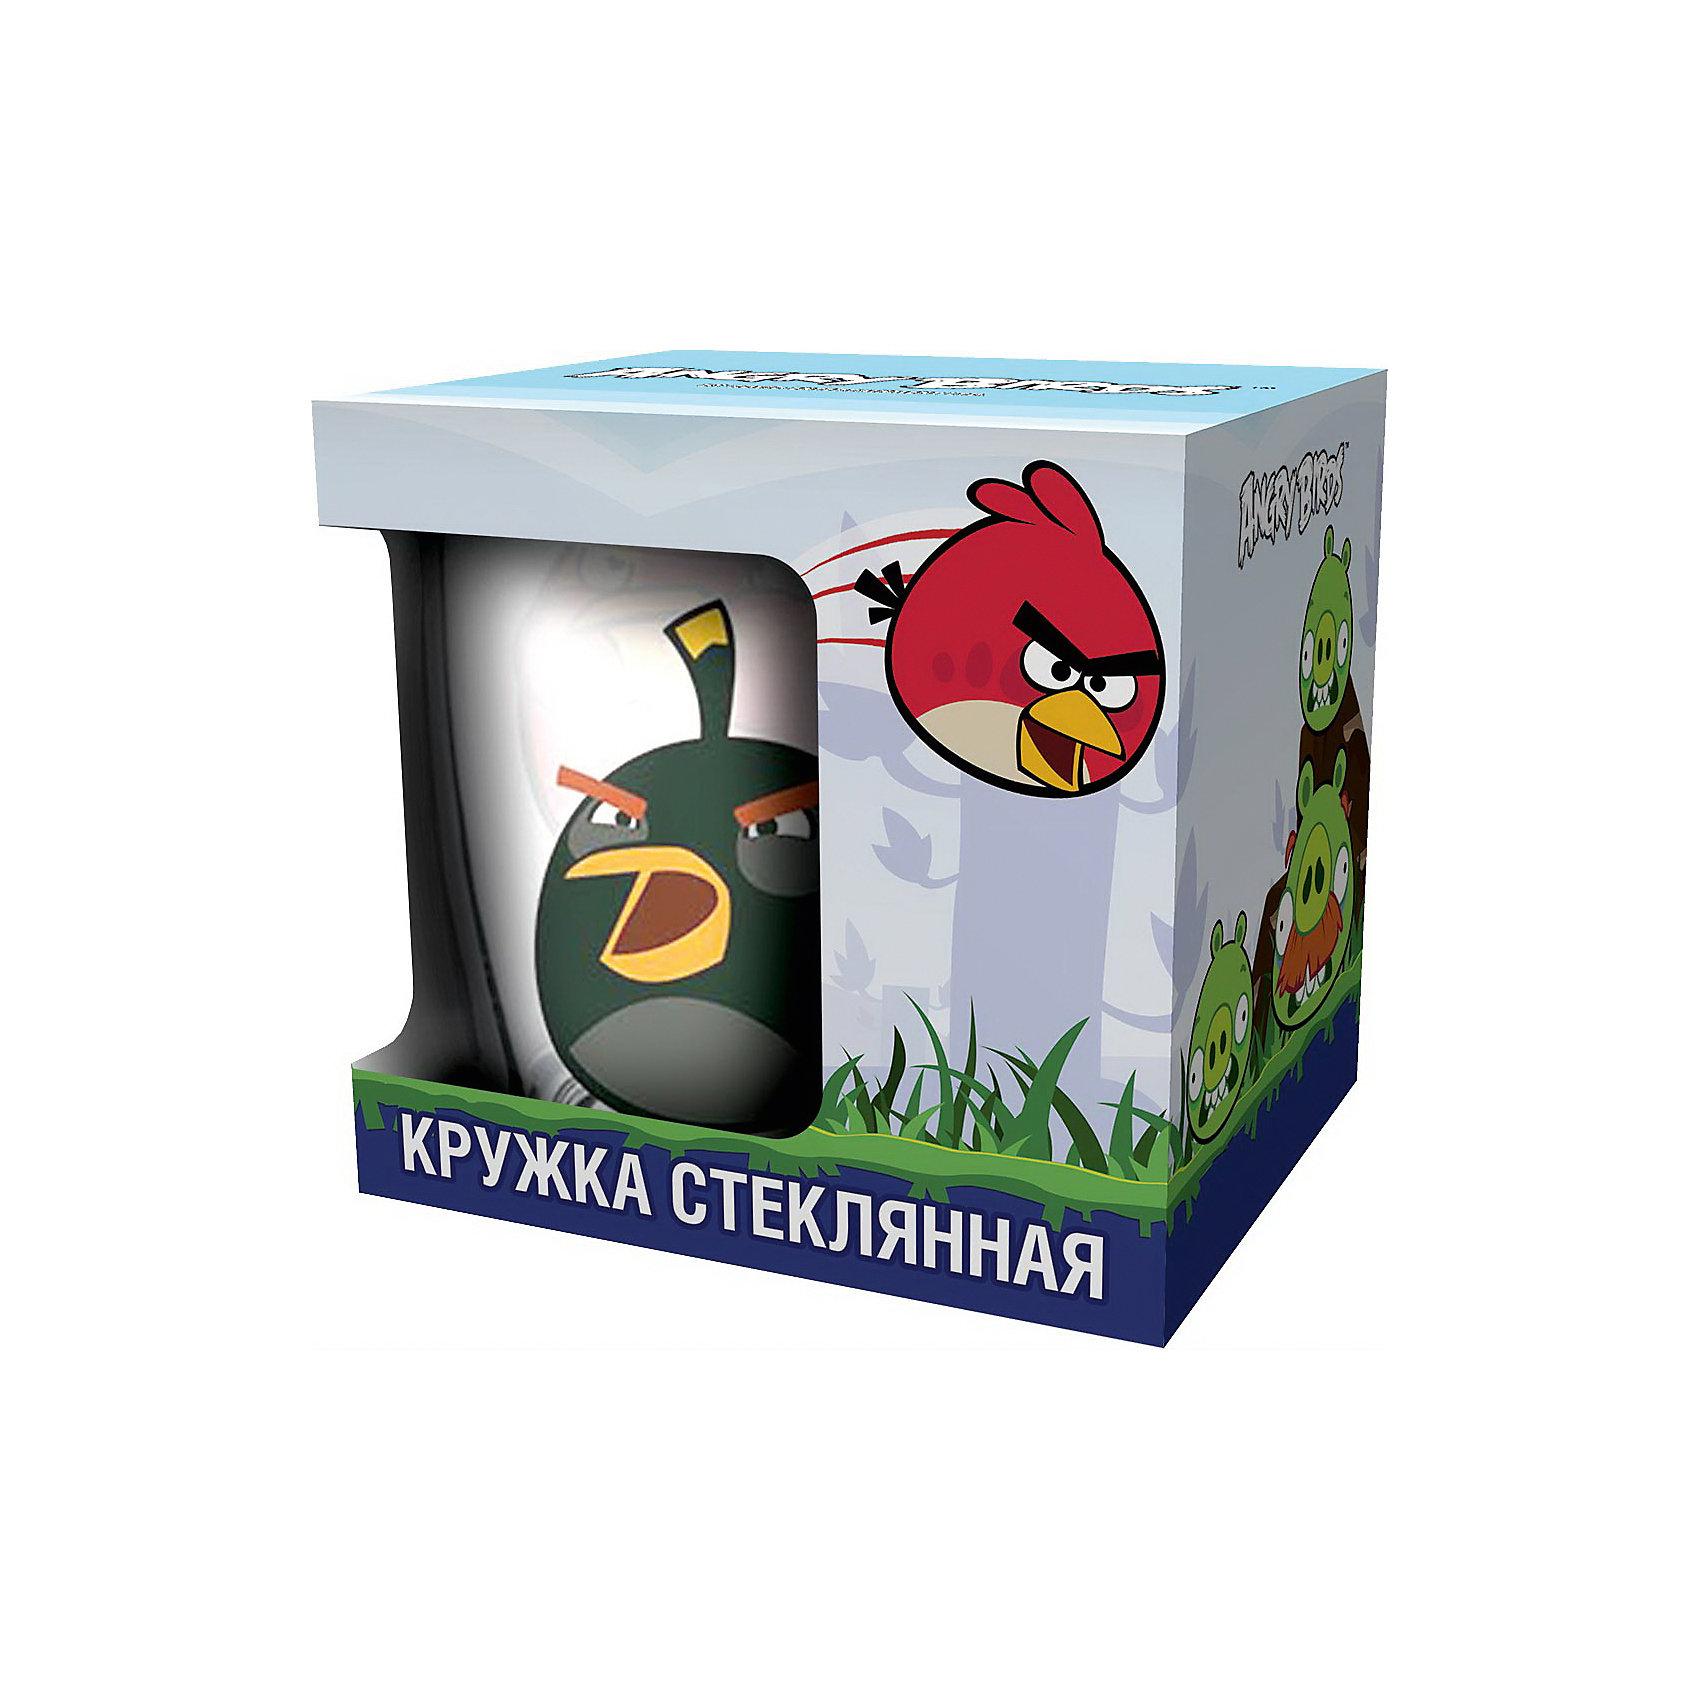 Кружка «Черная птица» 300 мл (стекло), Angry Birds